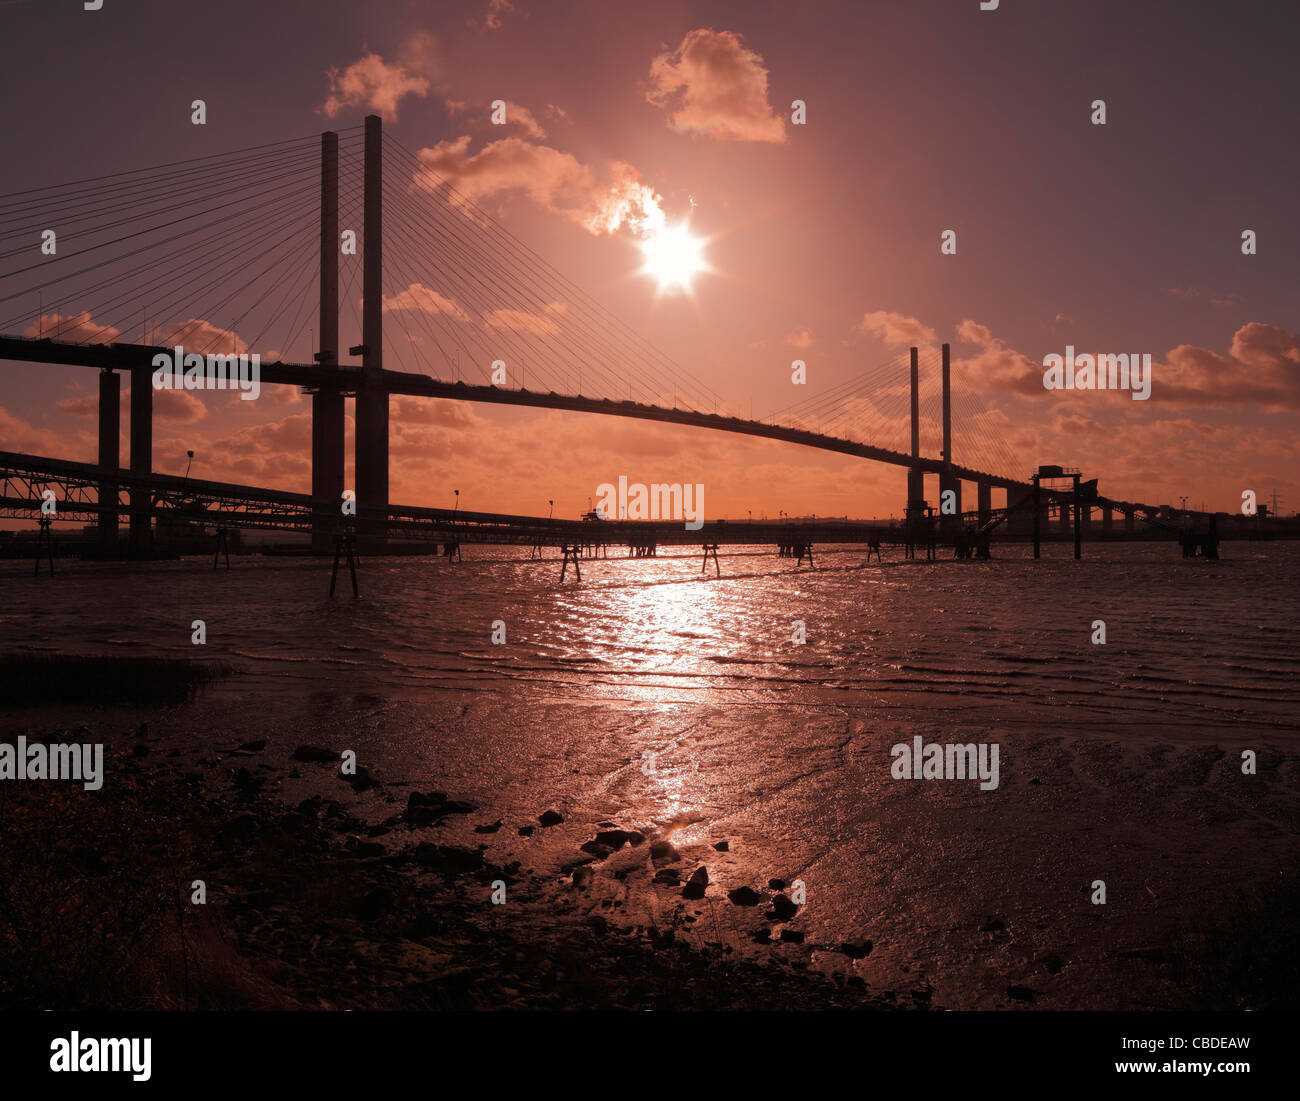 The Queen Elizabeth bridge at Dartford - Thurrock. - Stock Image